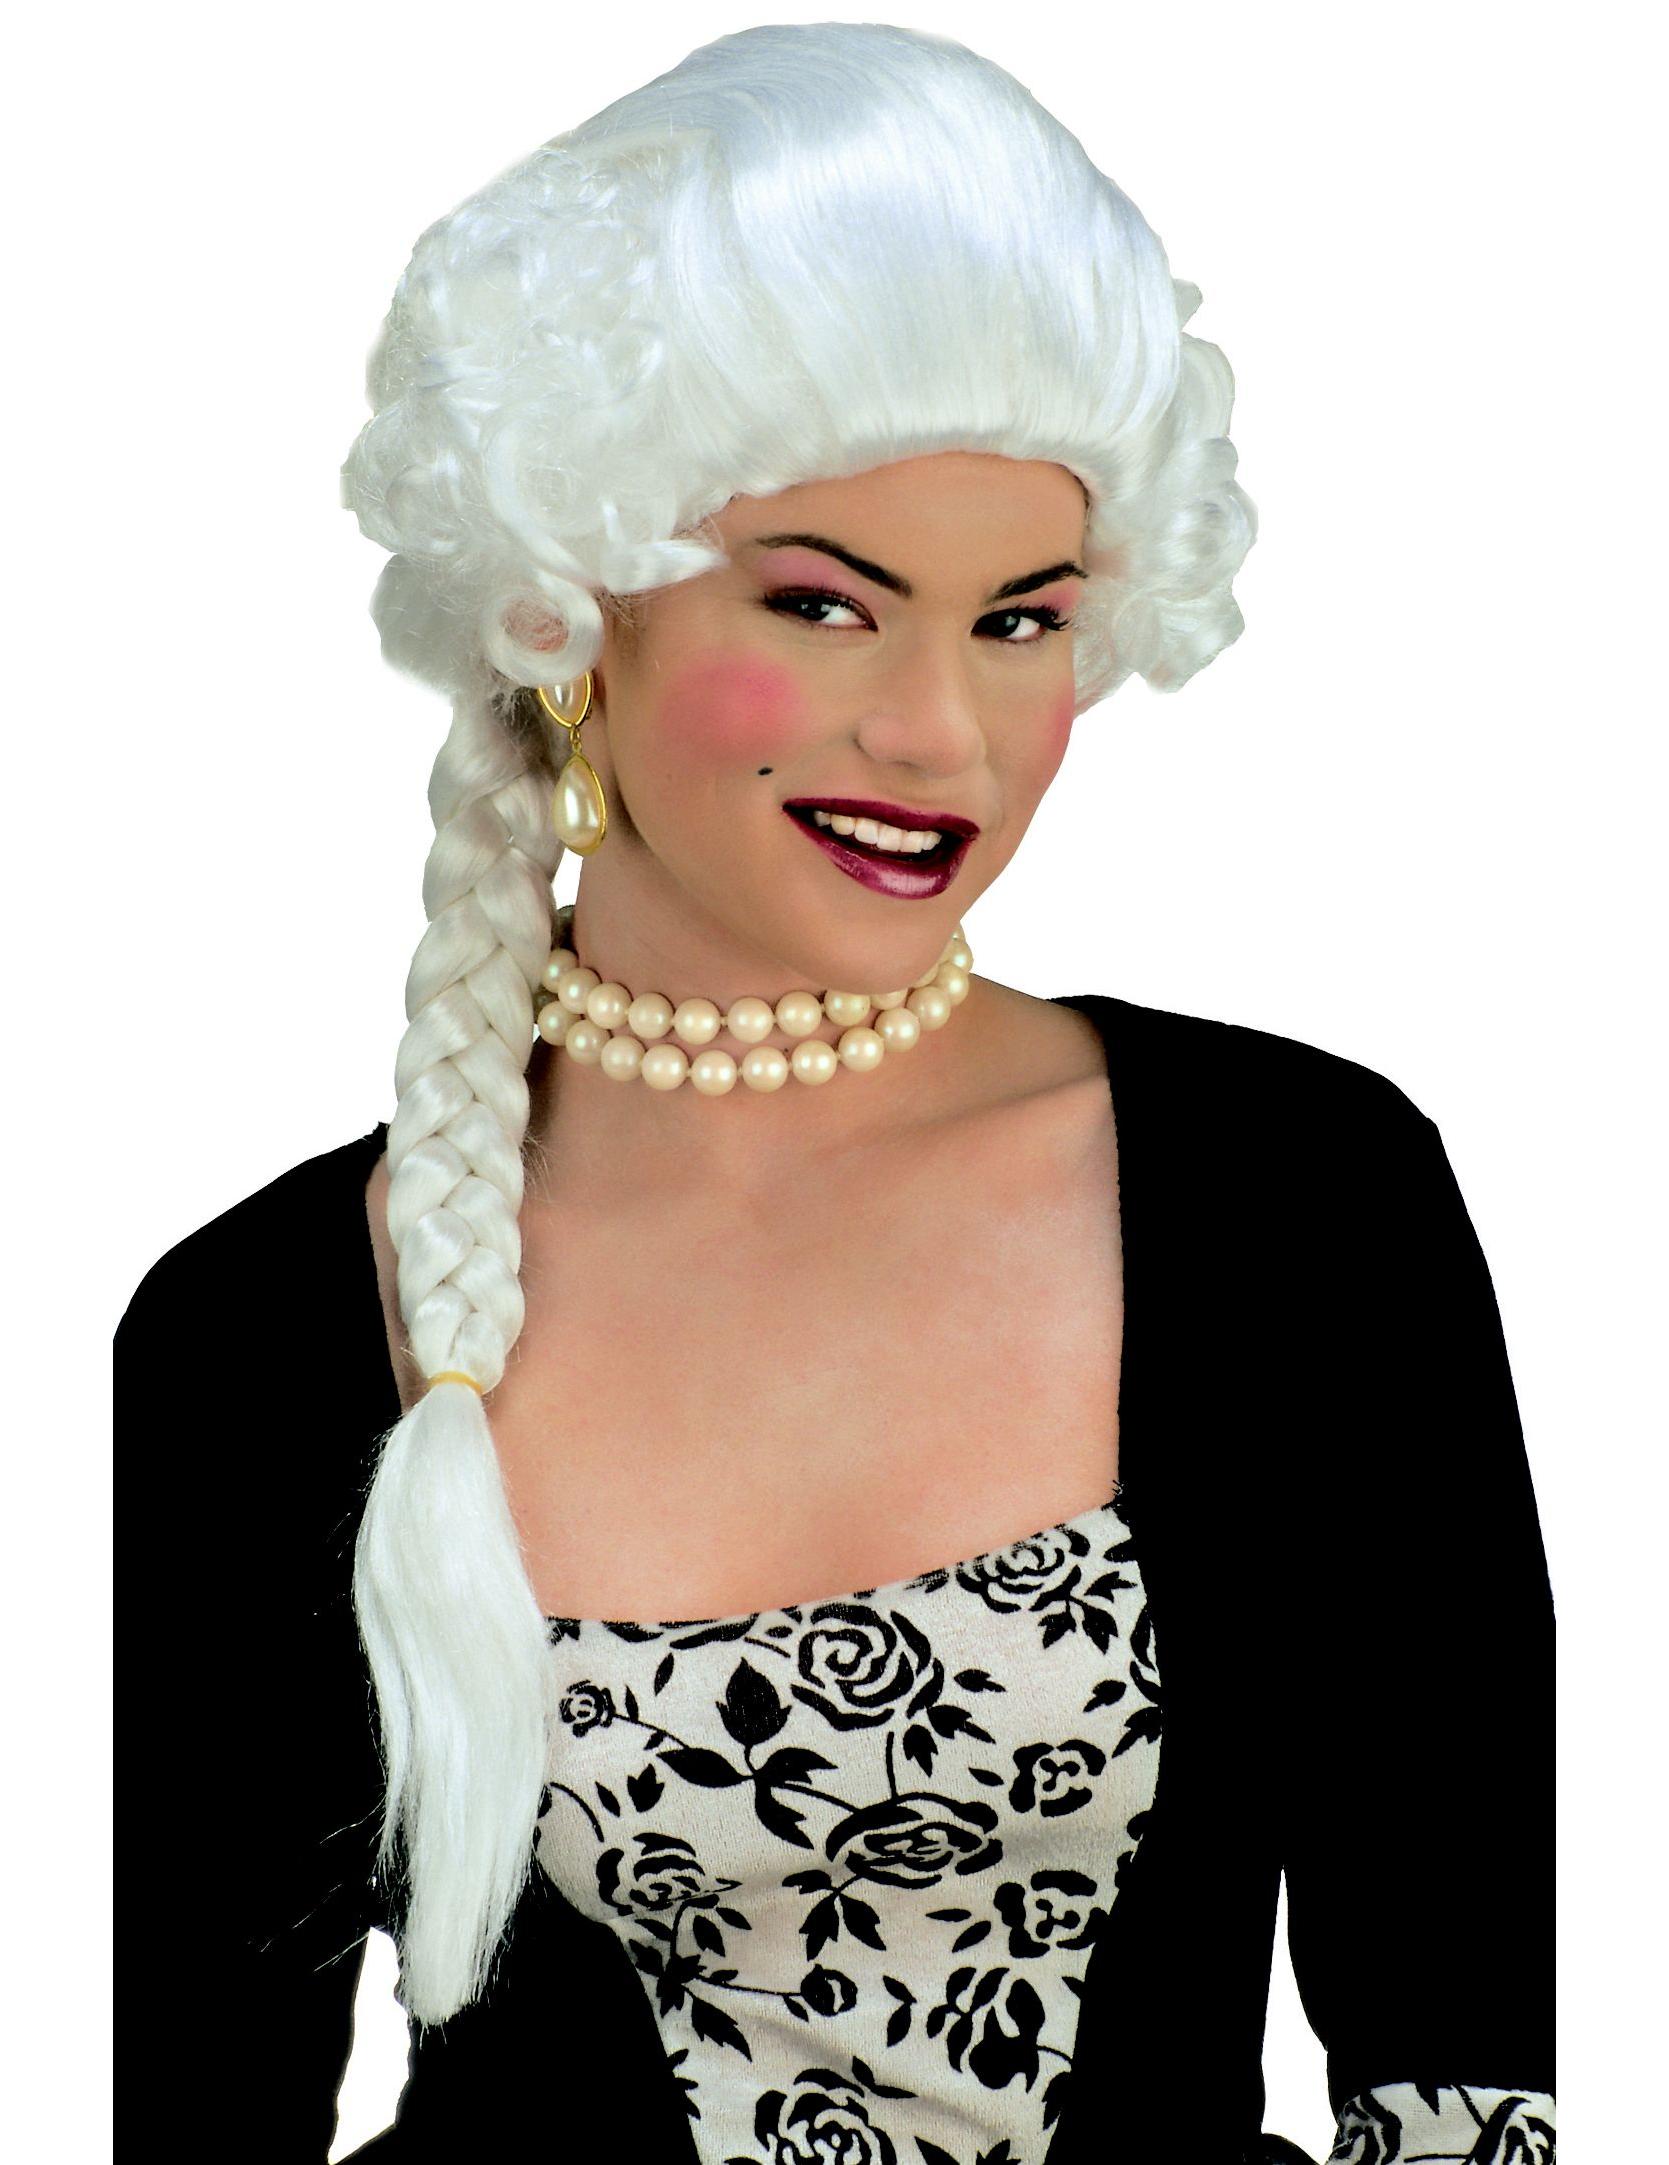 hertoginnenpruik voor dames pruiken en goedkope carnavalskleding vegaoo. Black Bedroom Furniture Sets. Home Design Ideas